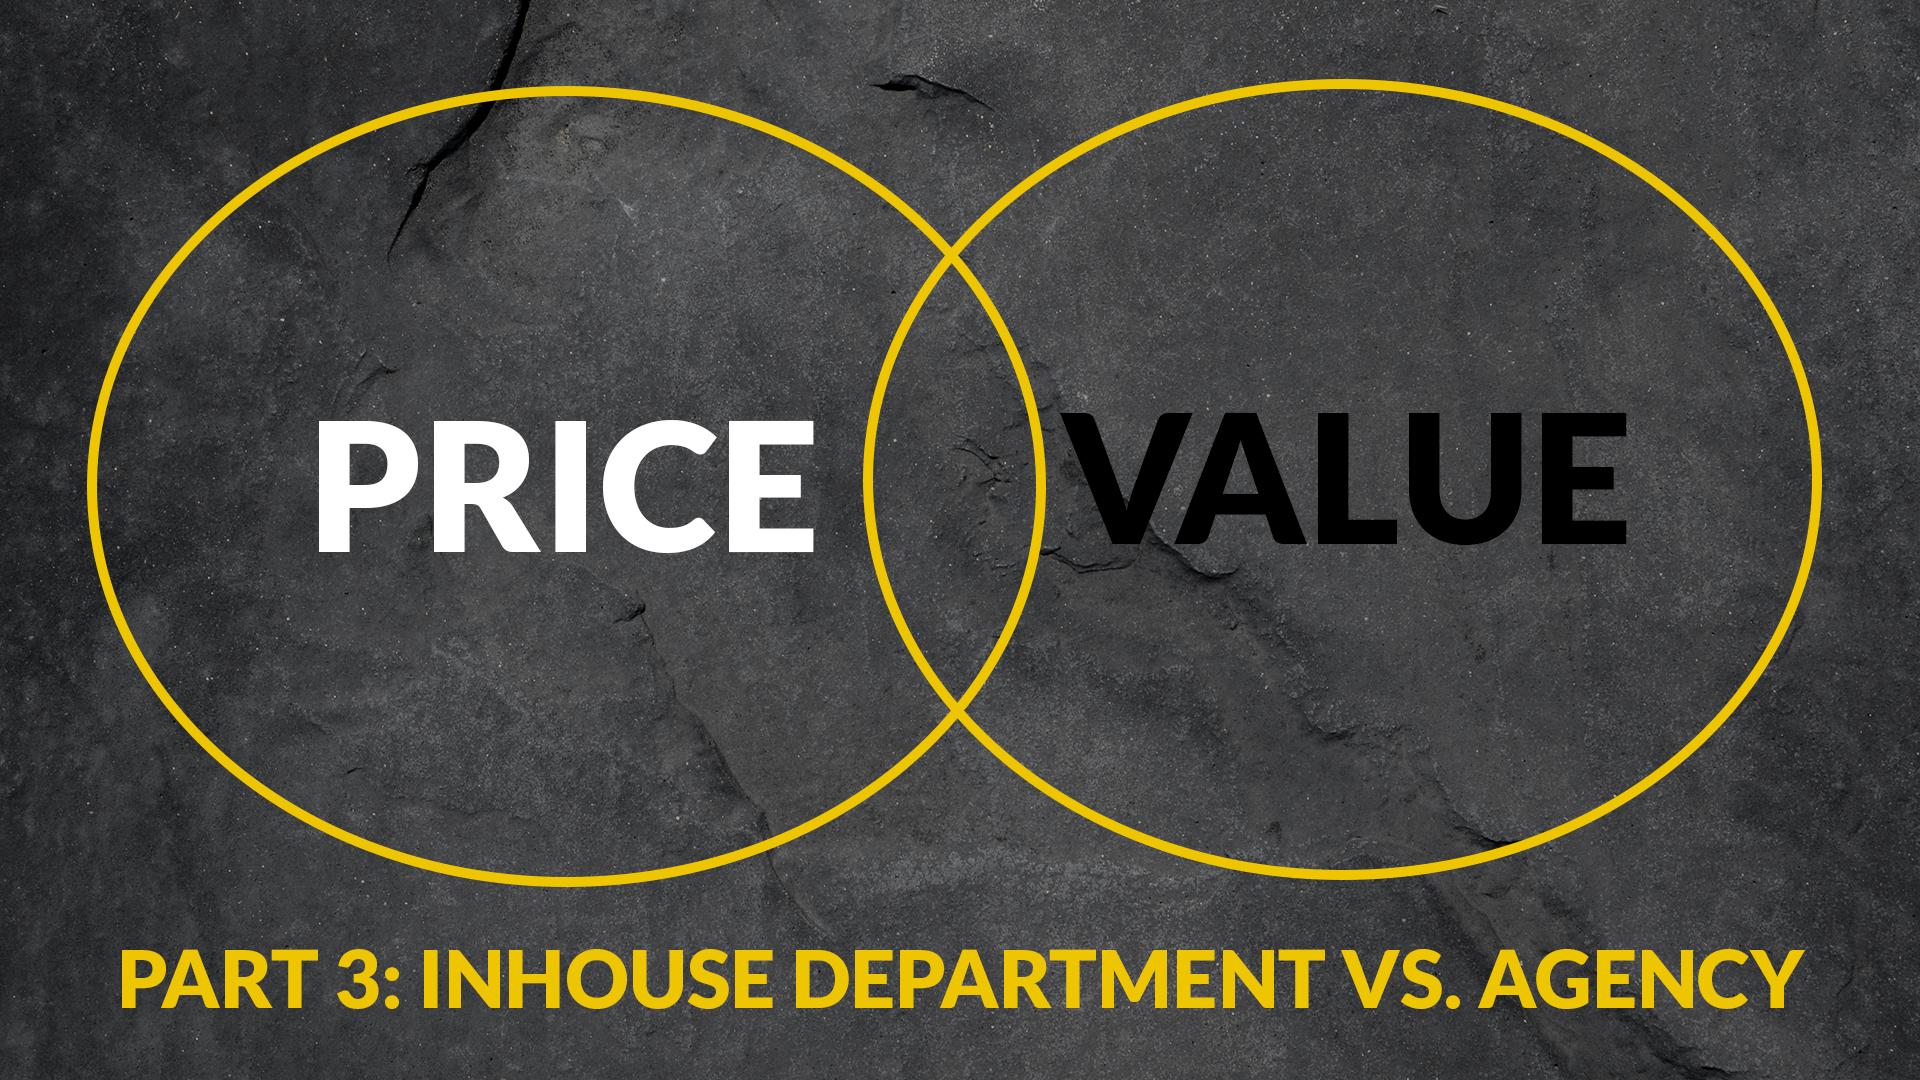 Inhouse Department vs Agency